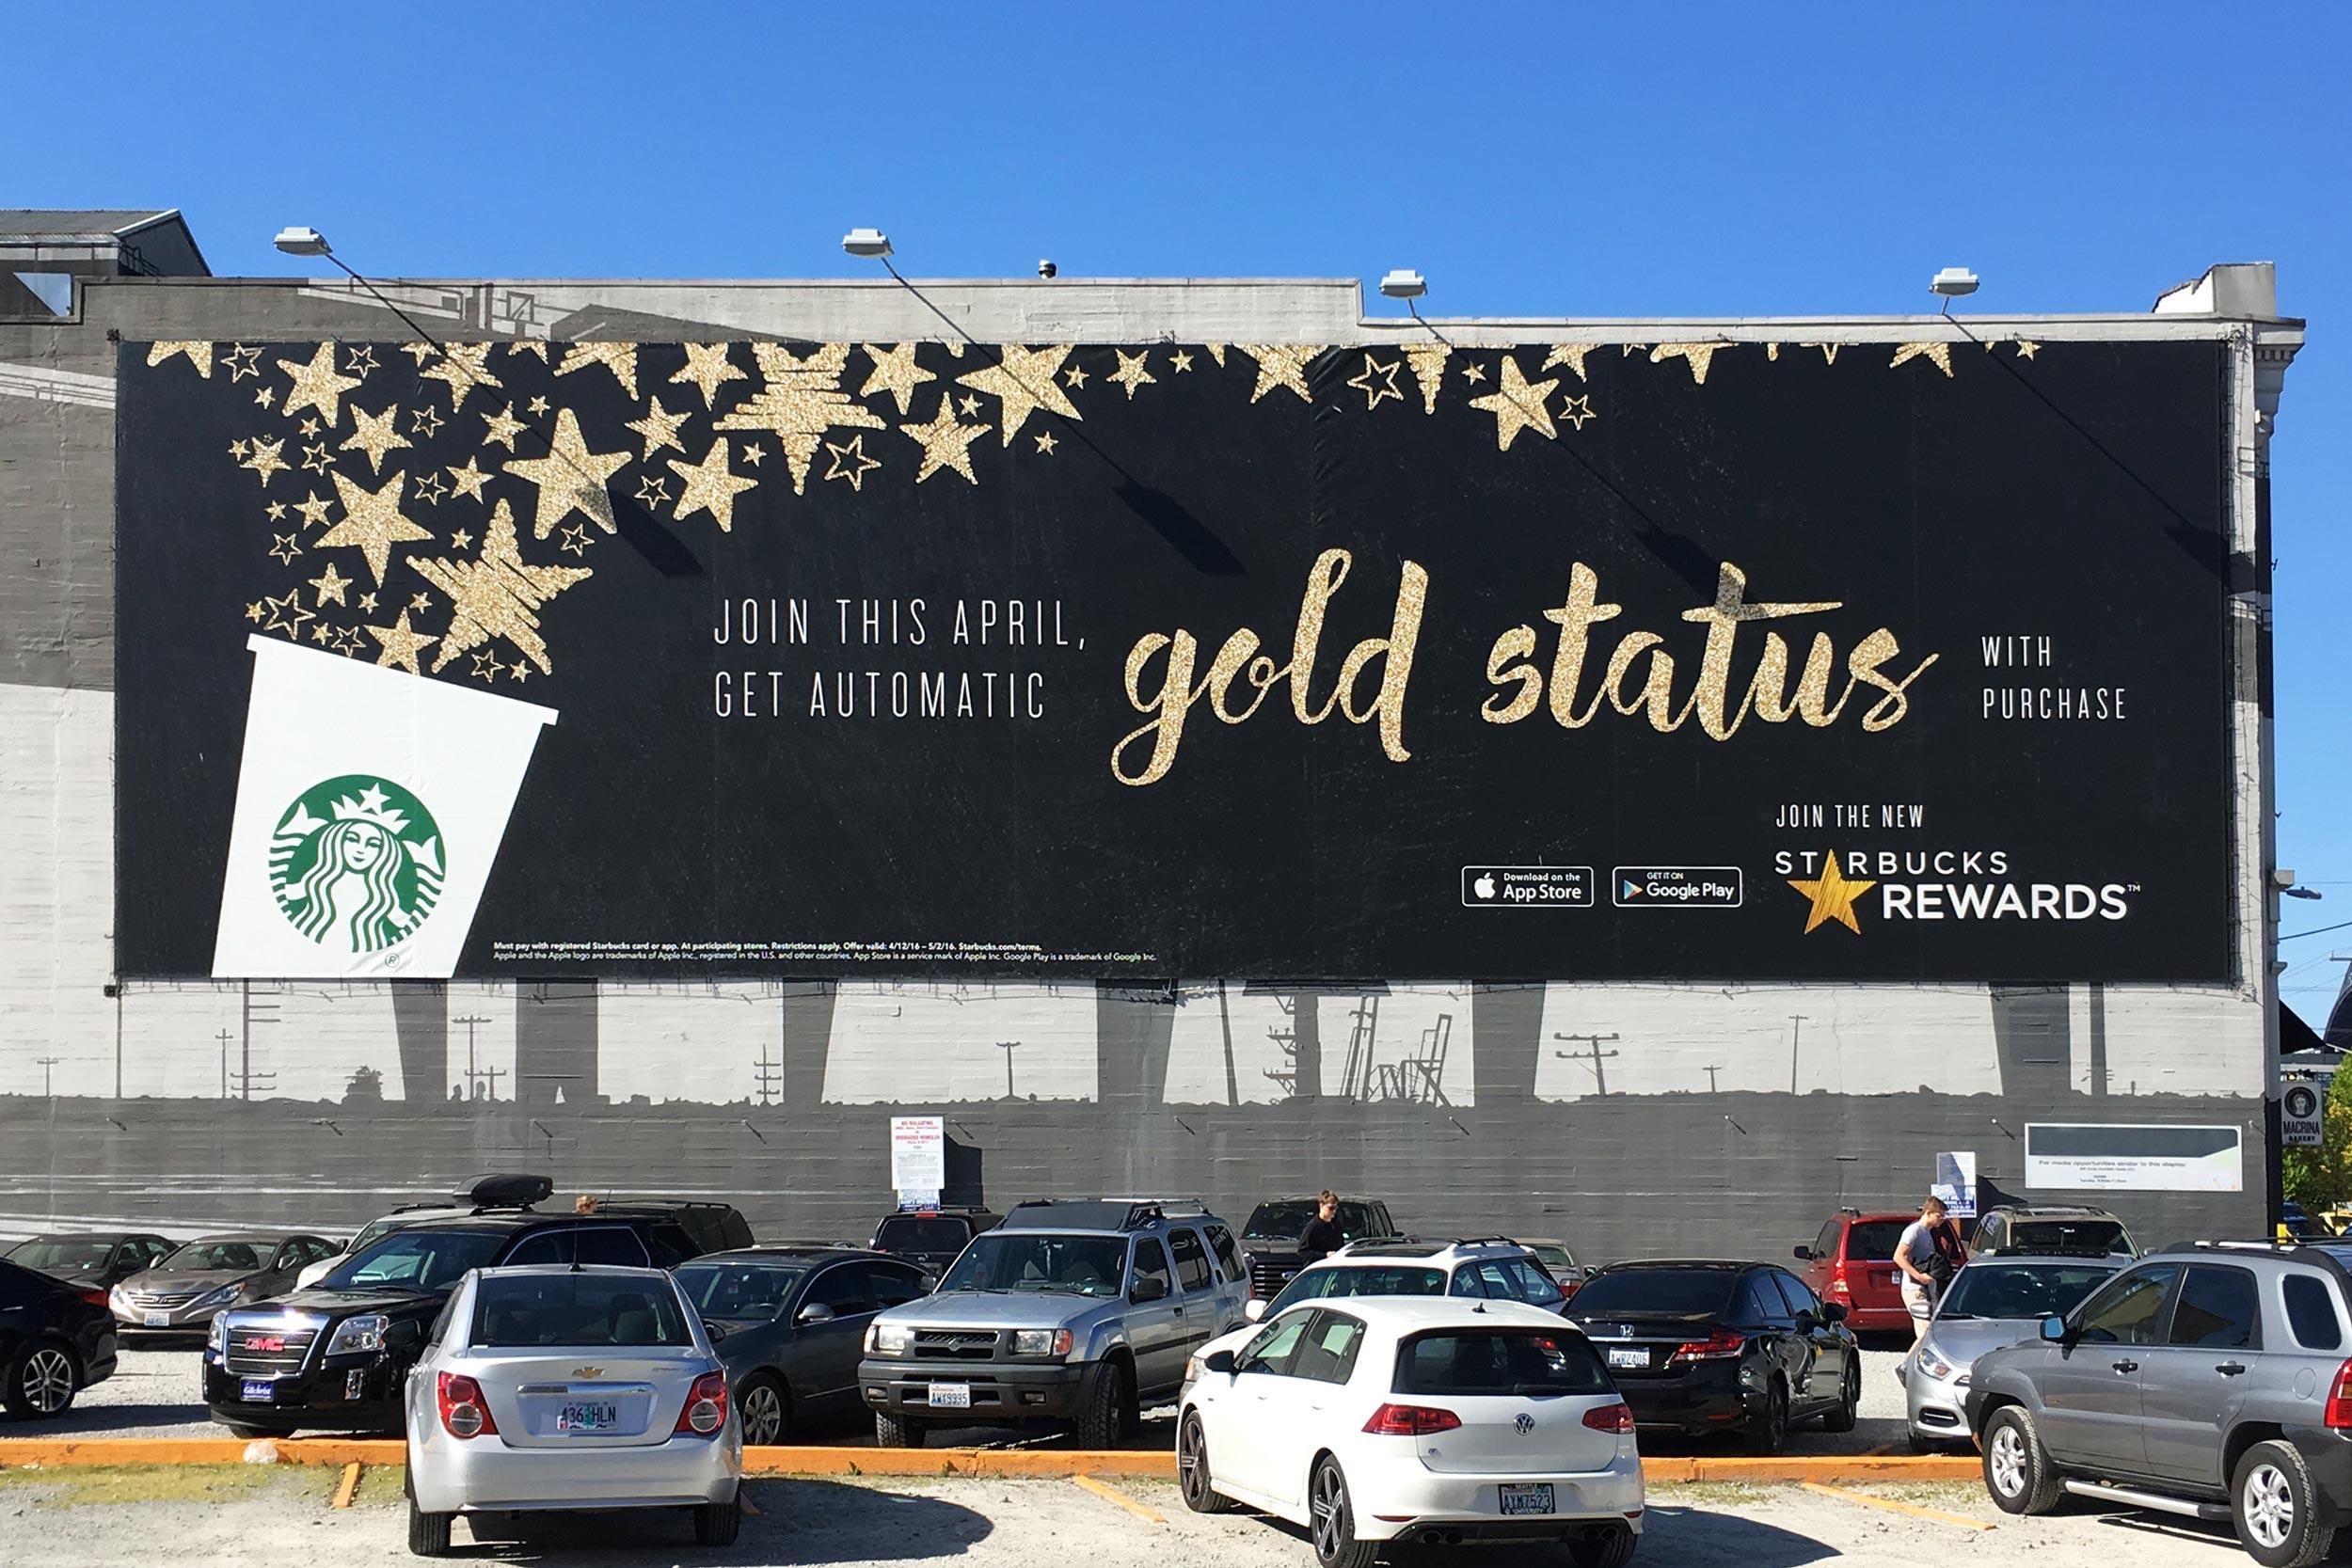 Starbucks Rewards Michael Lortz